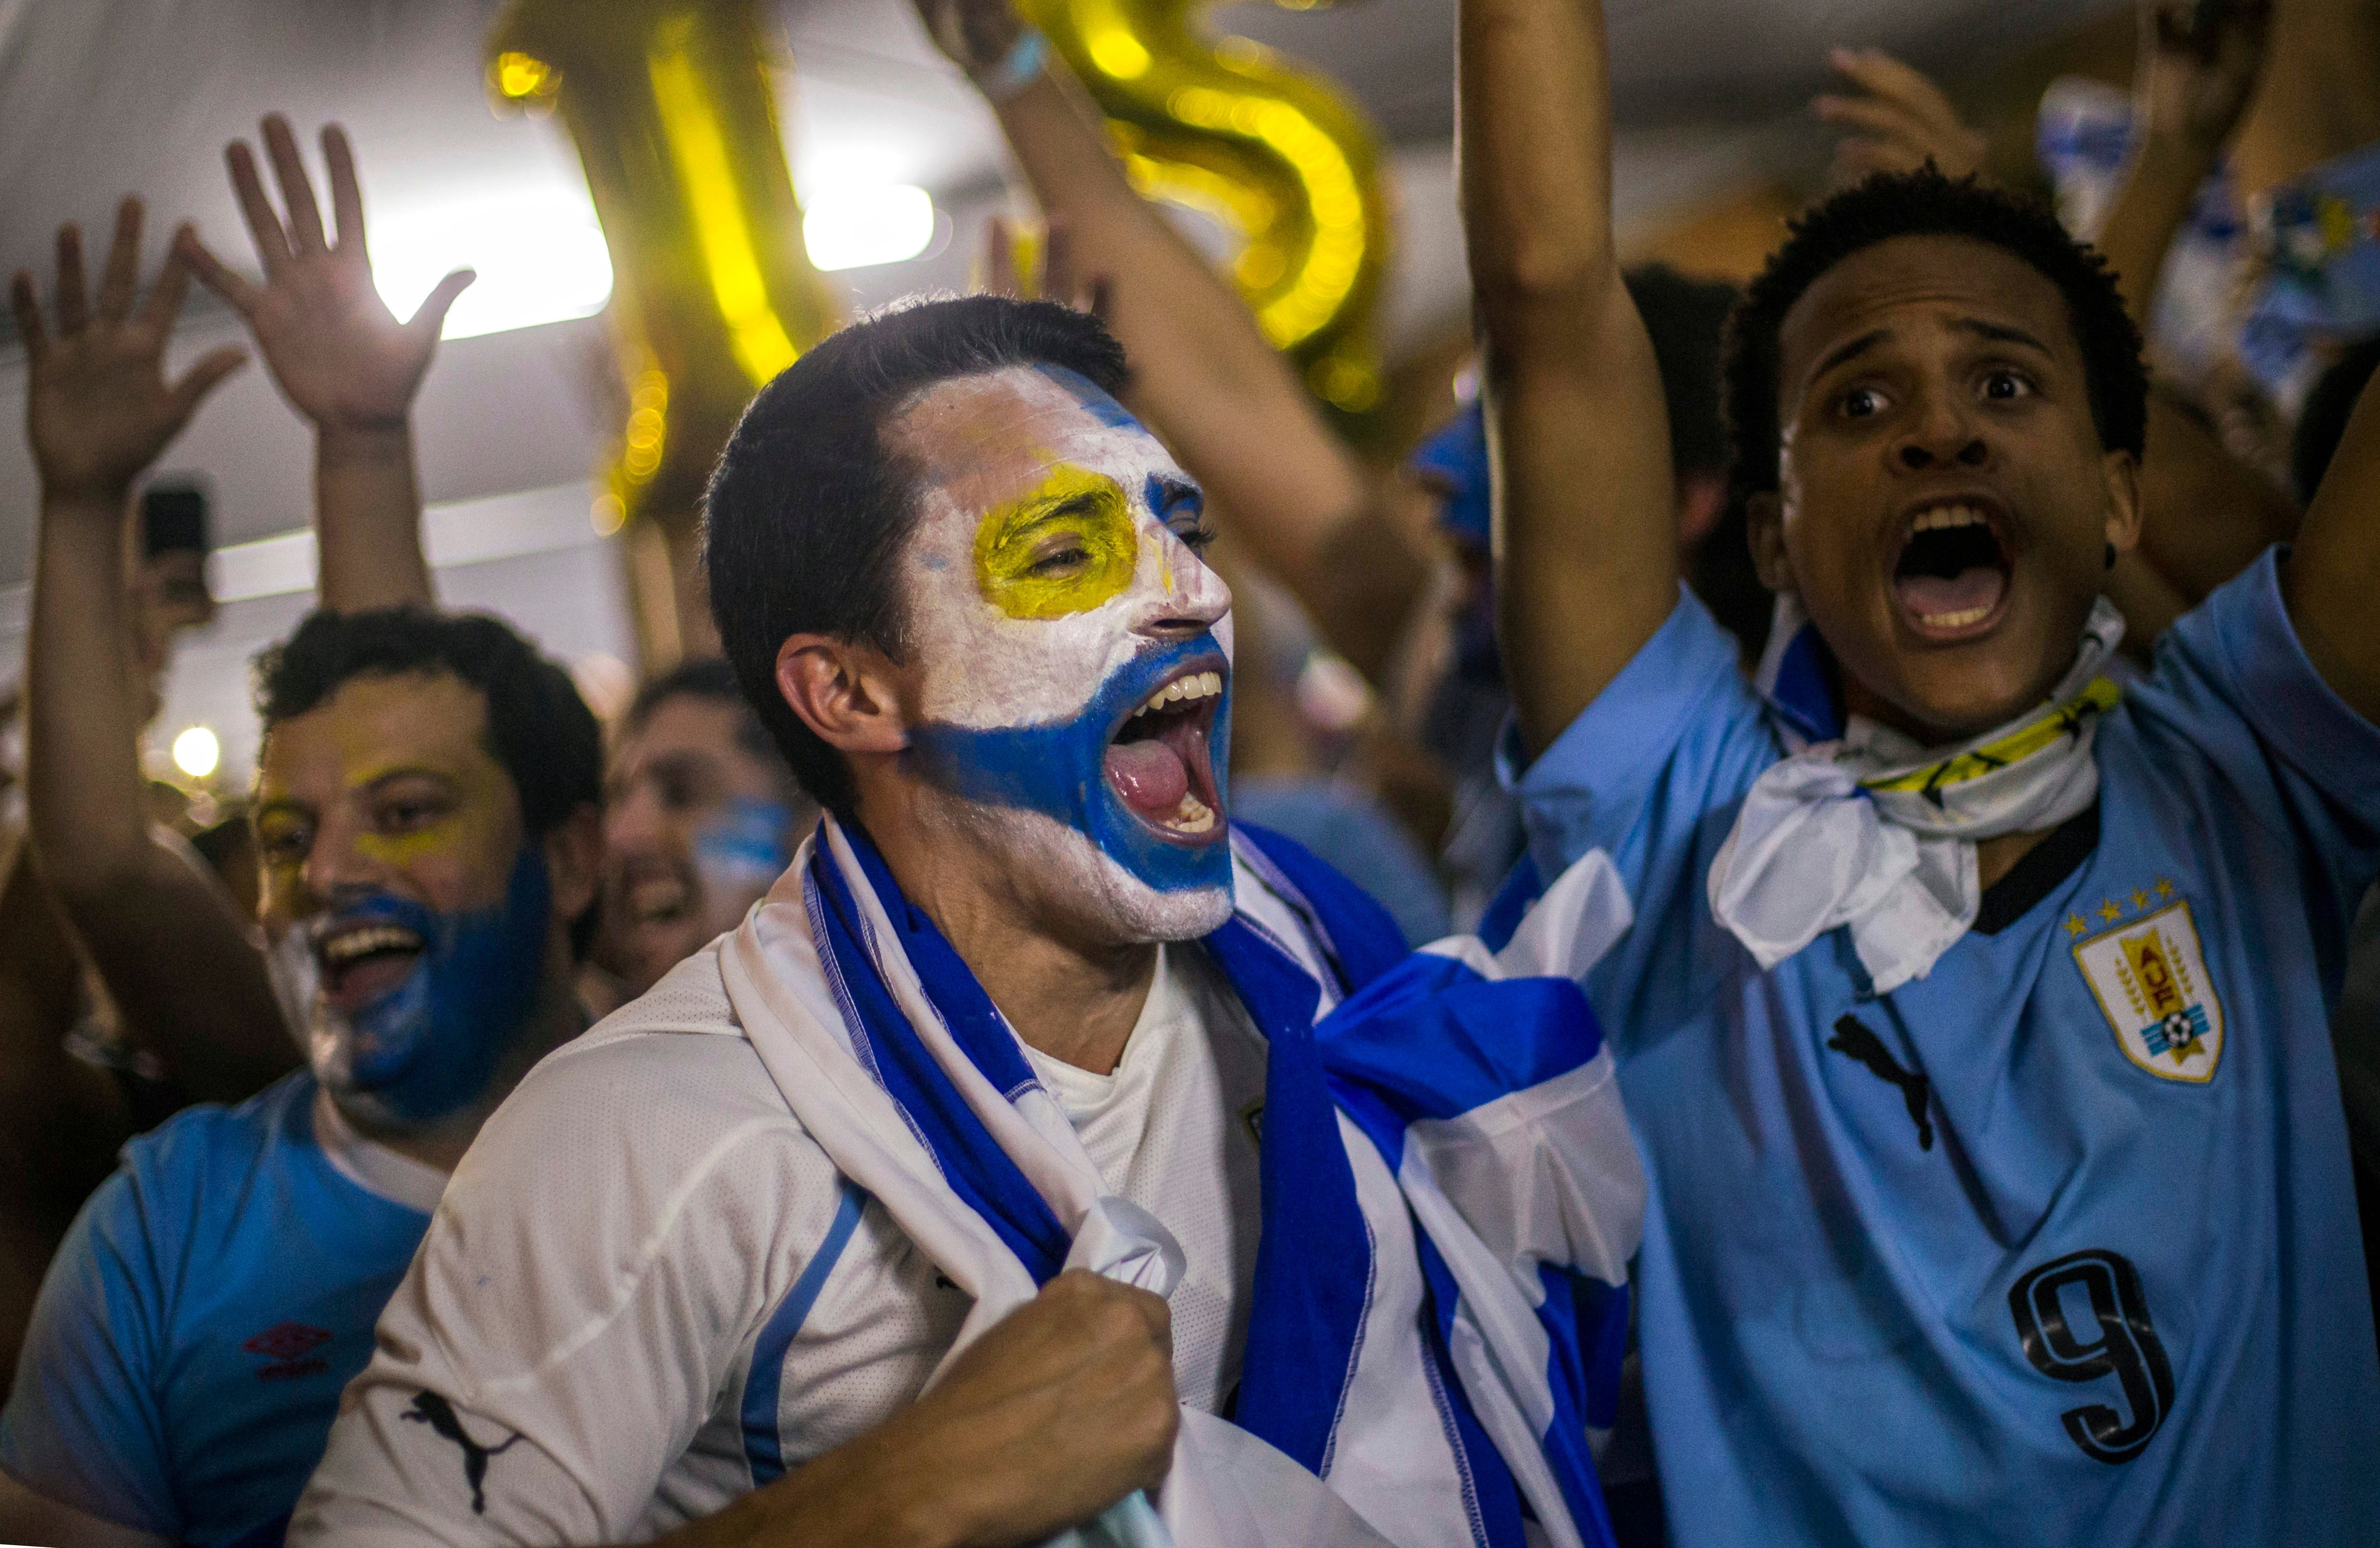 Supporters de l'Uruguay à la Copa América 2019